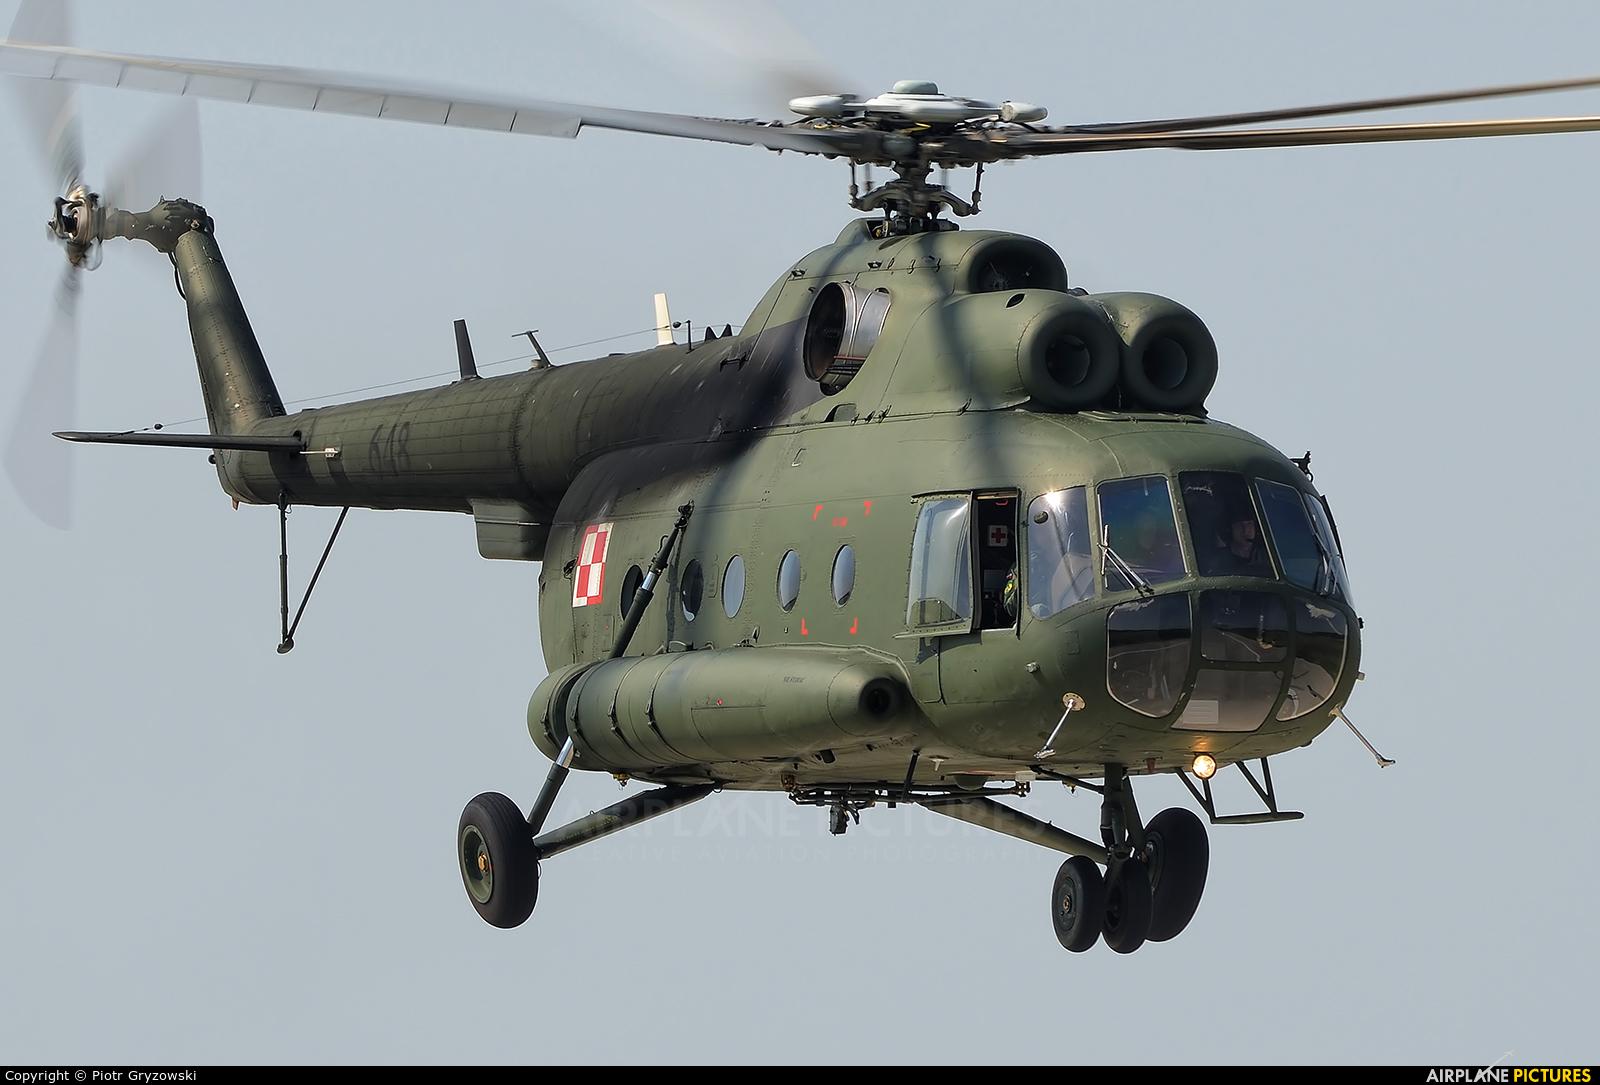 Poland - Army 648 aircraft at Mińsk Mazowiecki